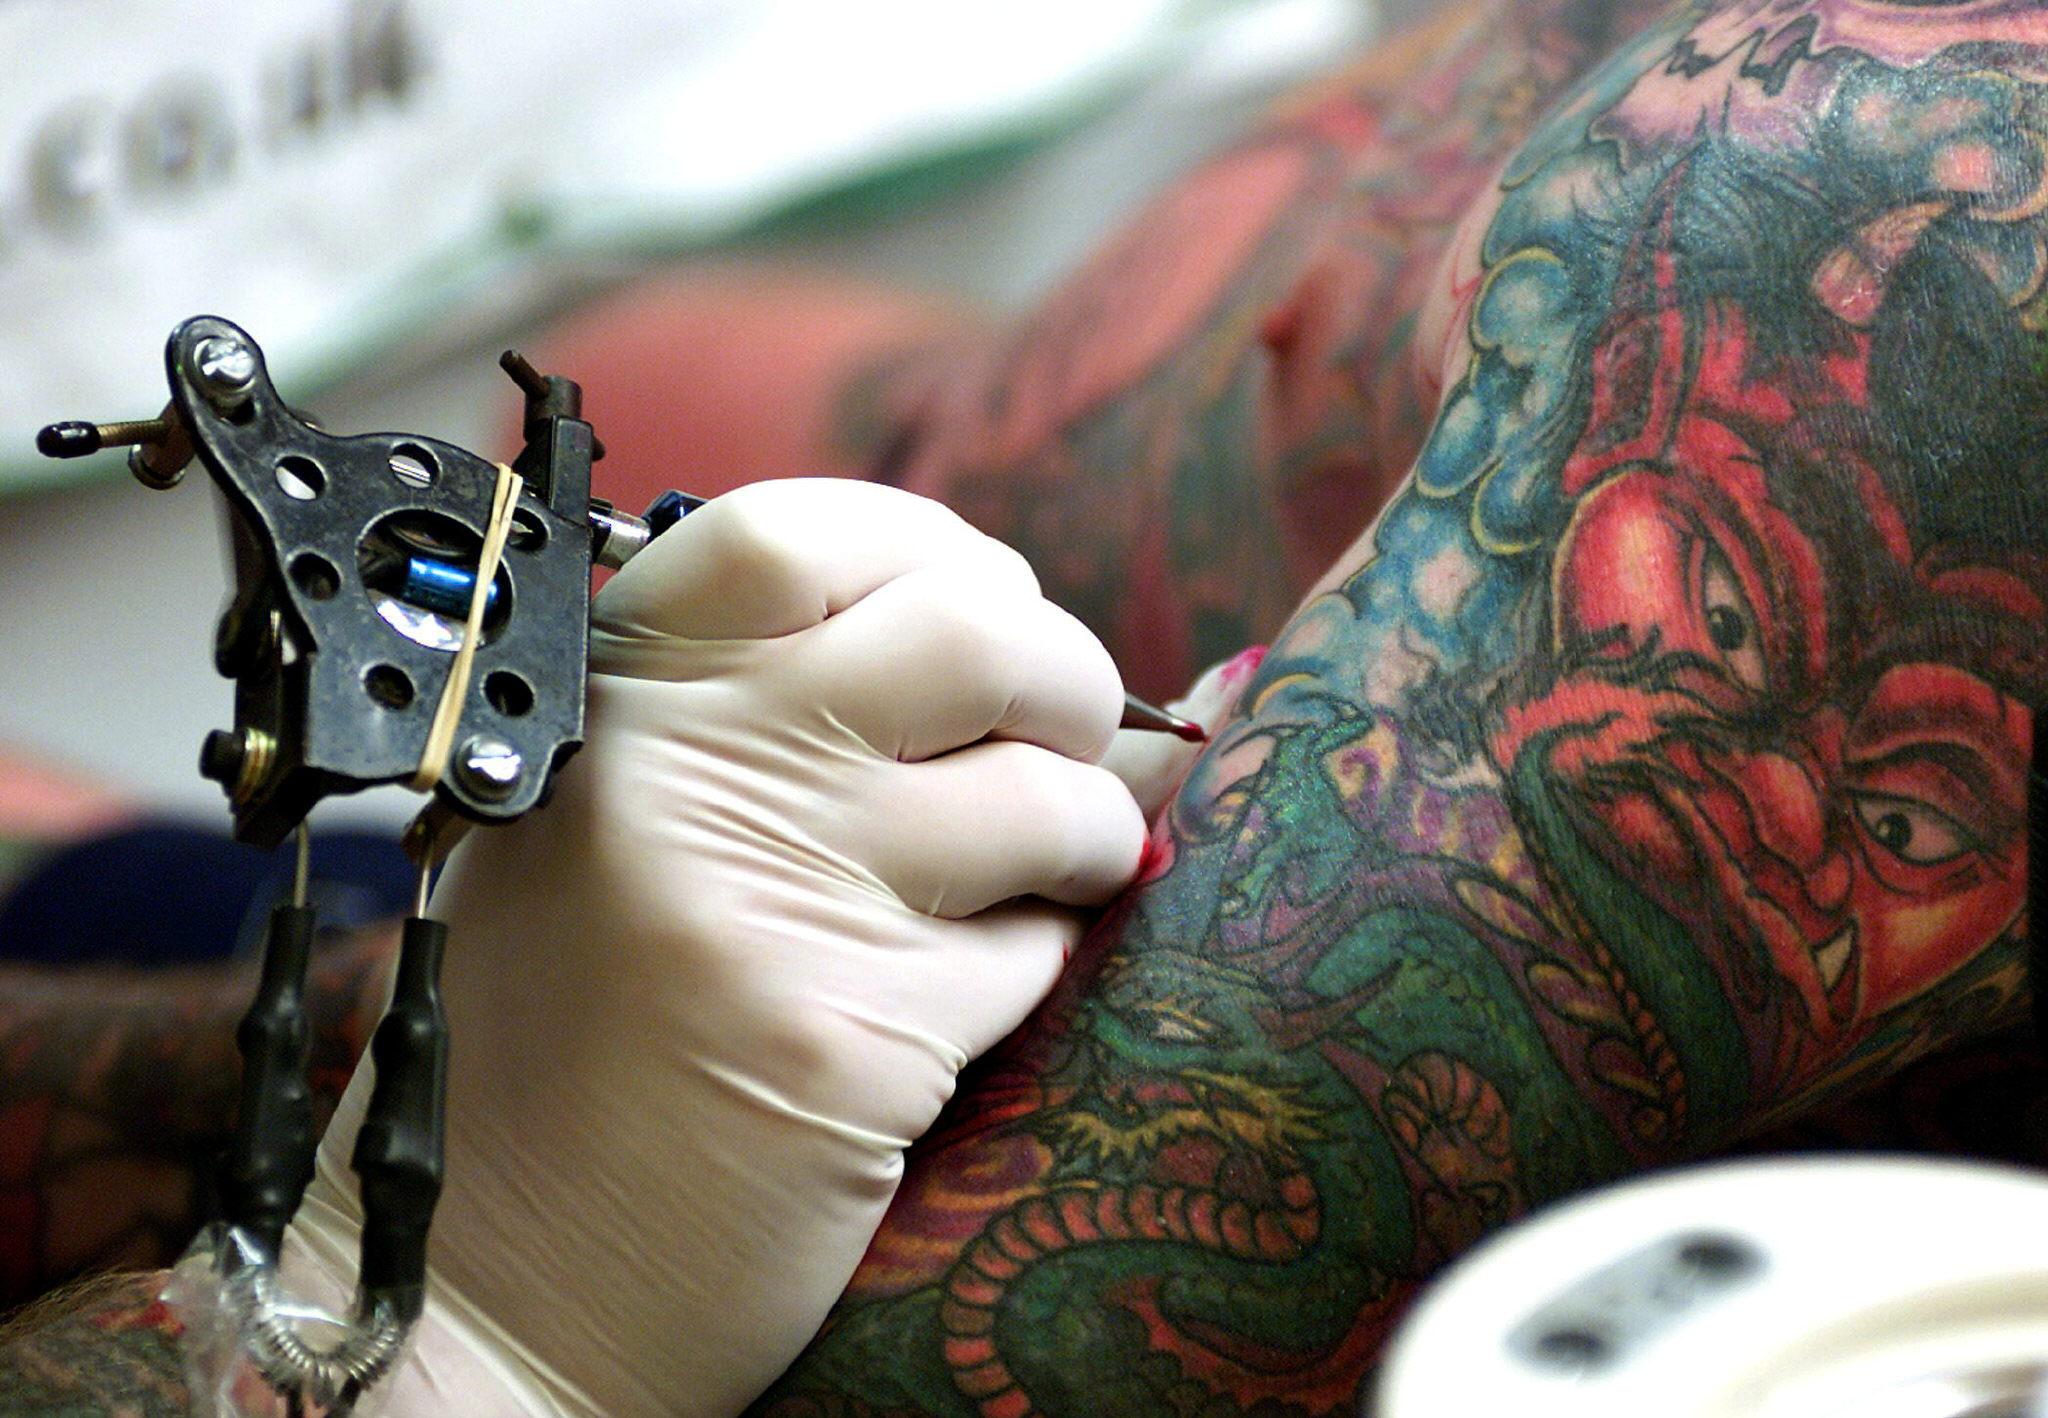 Reglas para hacerse un tatuaje